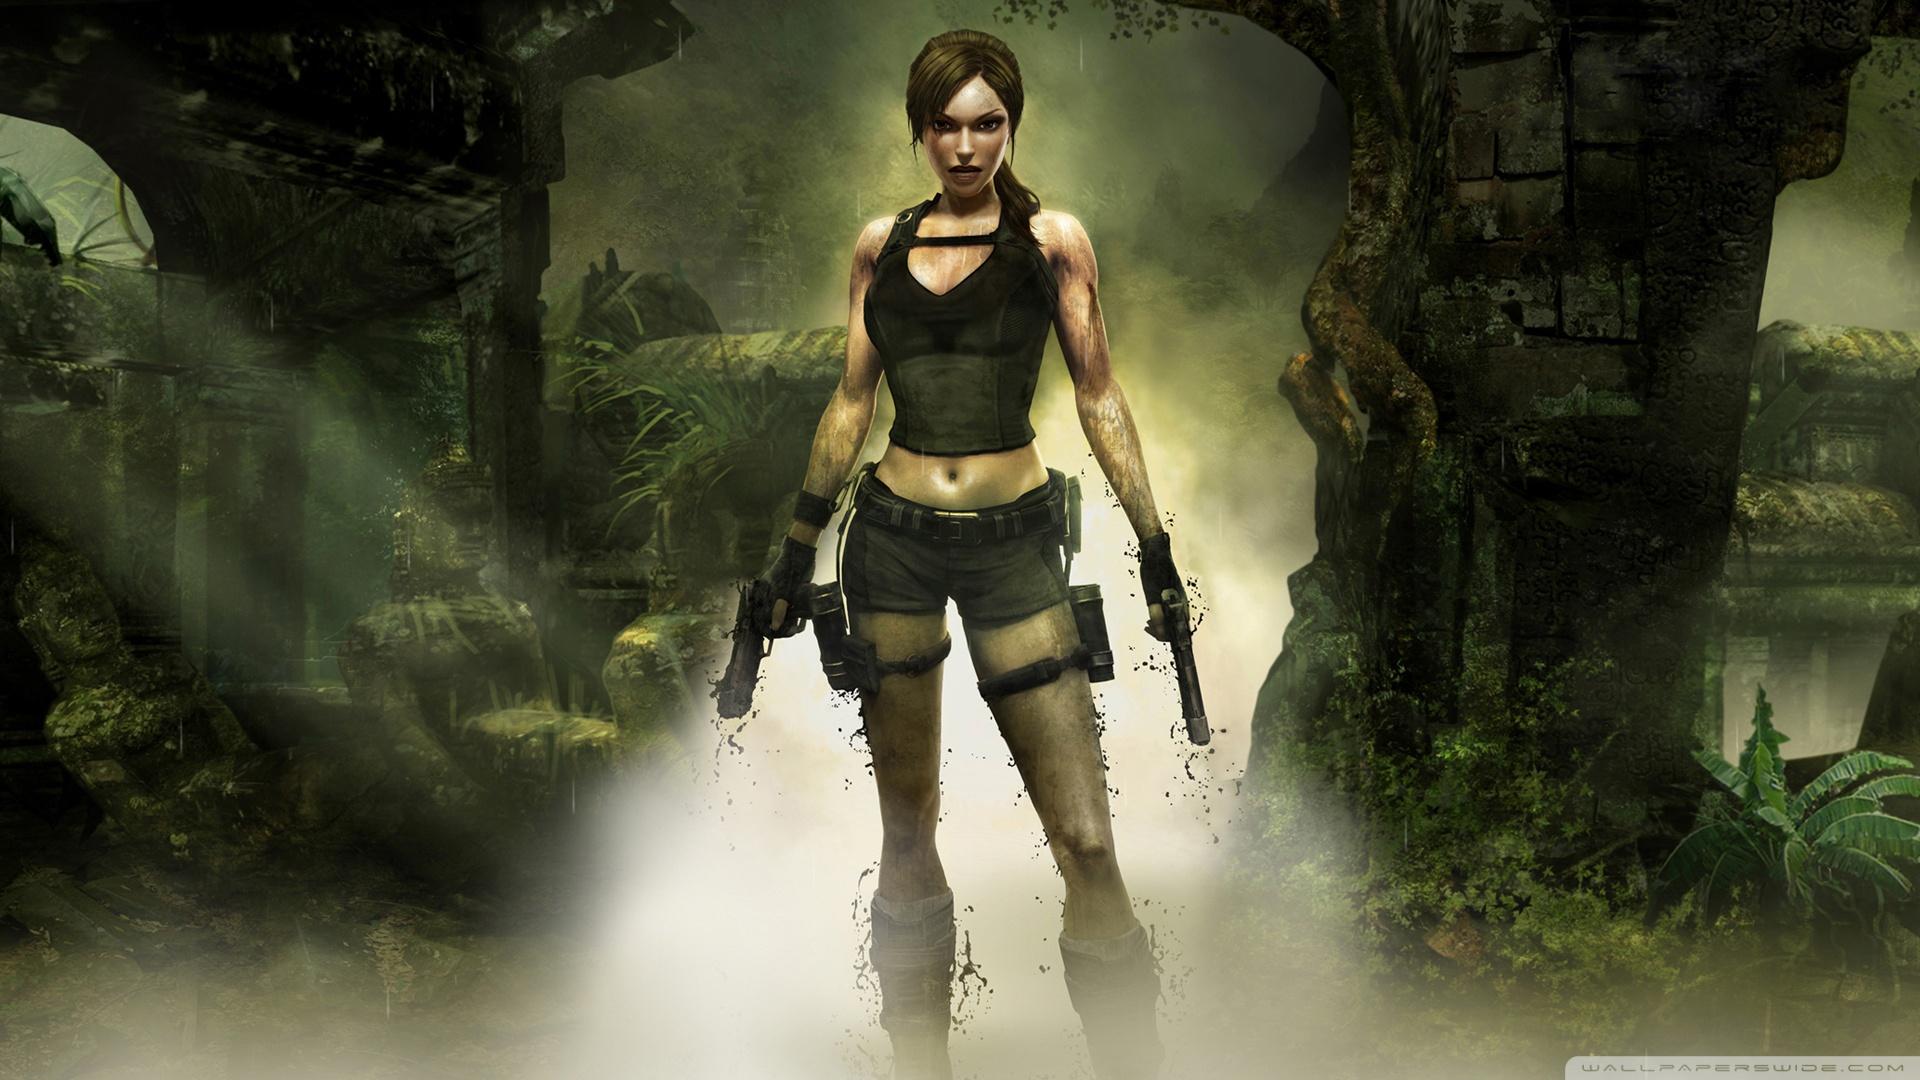 Tomb Raider Underworld Game Wallpaper 1920x1080 Tomb Raider 1920x1080